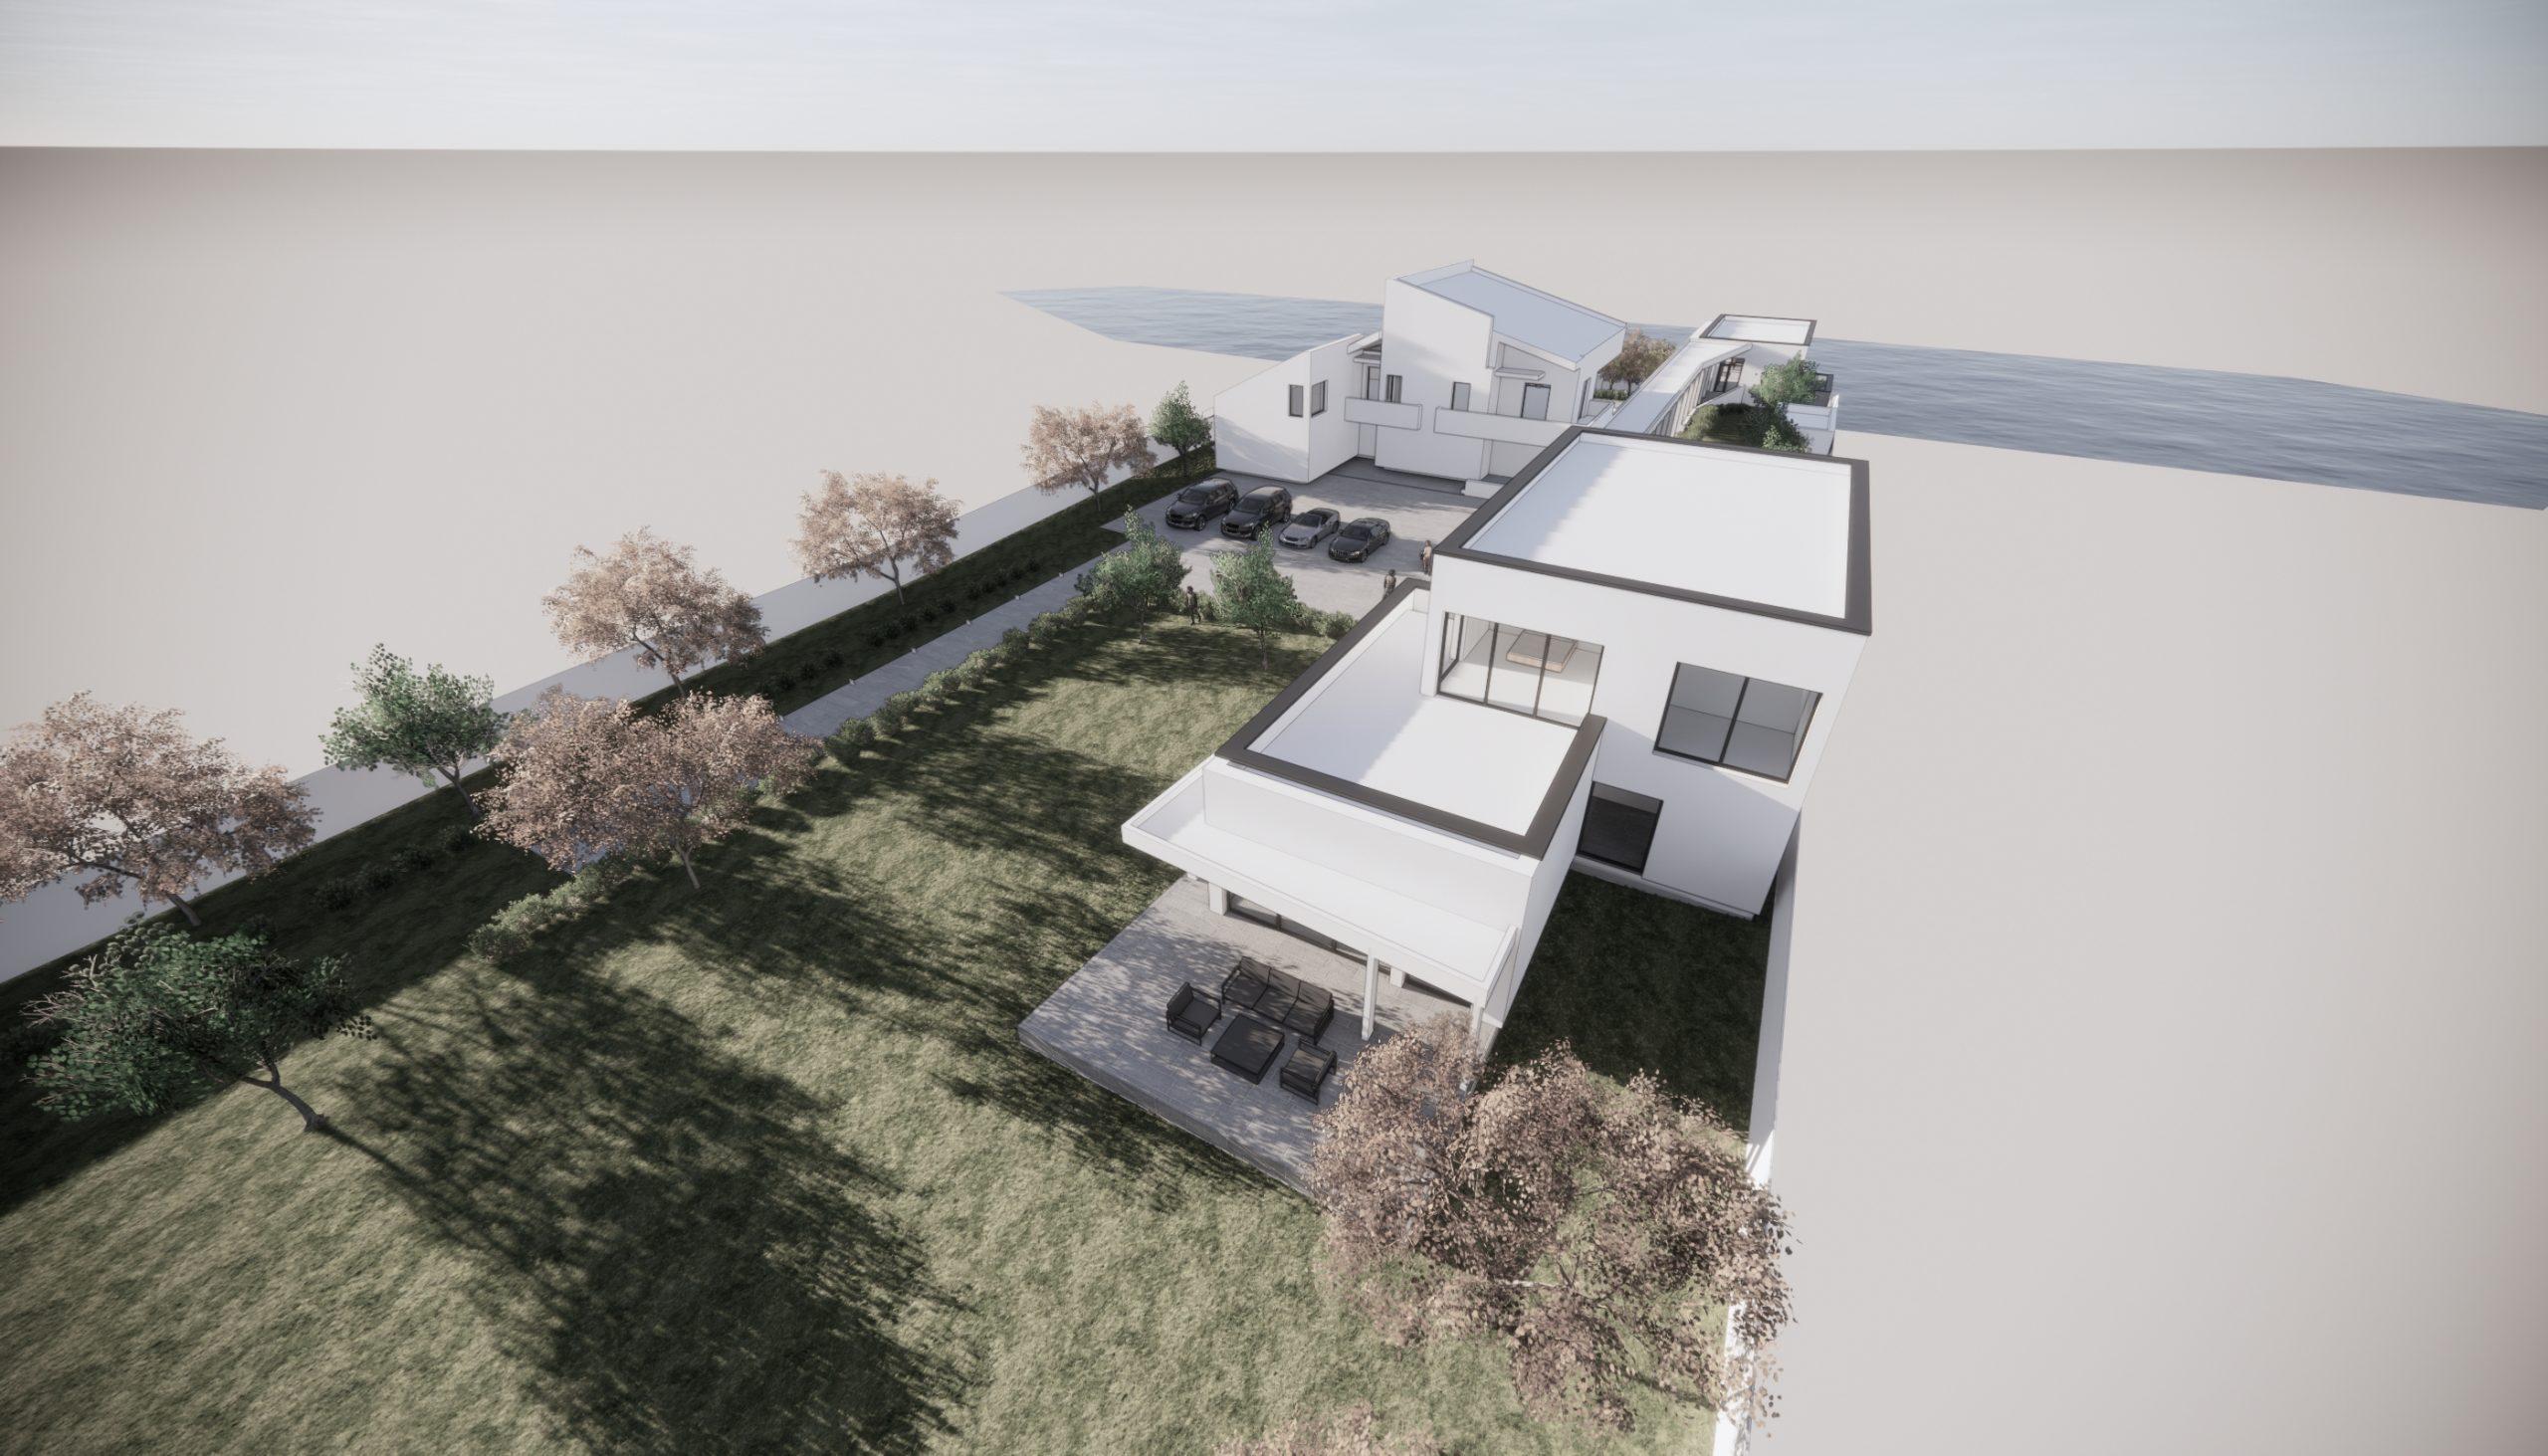 https://nbc-arhitect.ro/wp-content/uploads/2020/11/NBC-Arhitect-_-residential-_-2x-Snagov-_-Snagov-Romania_14-scaled.jpg